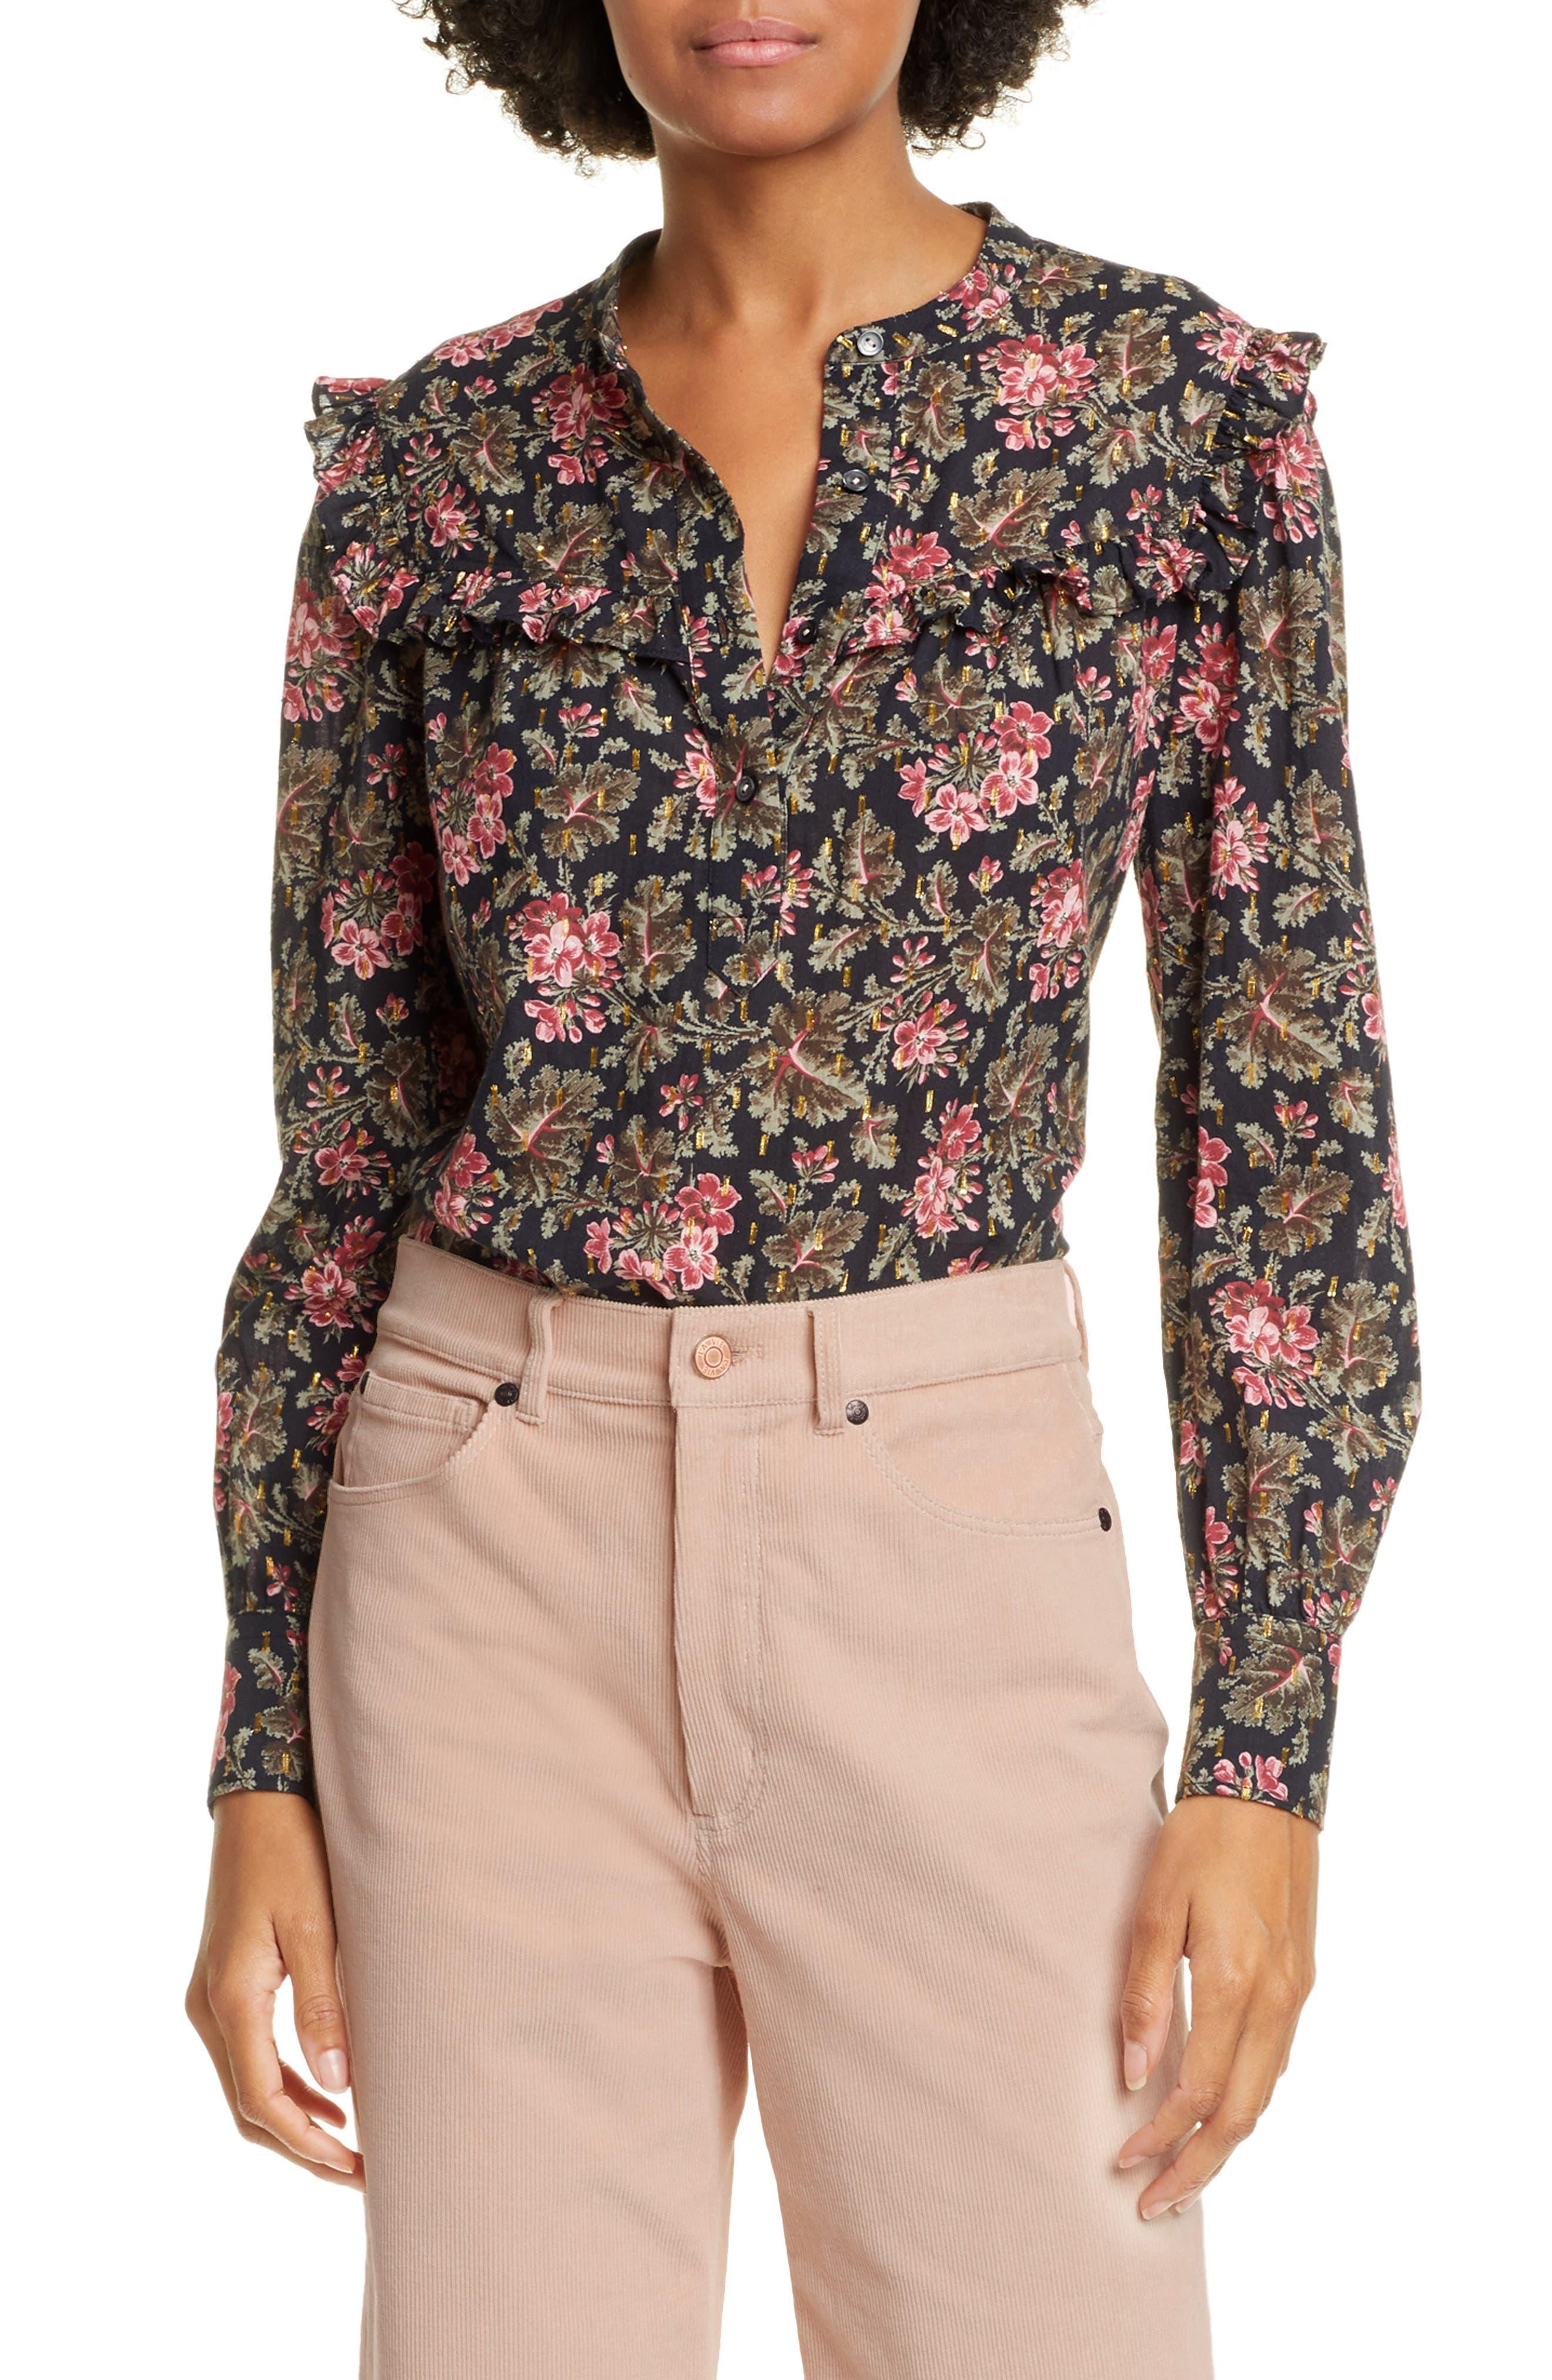 La Vie Rebecca Taylor Chouette Floral Metallic Detail Long Sleeve Cotton Shirt